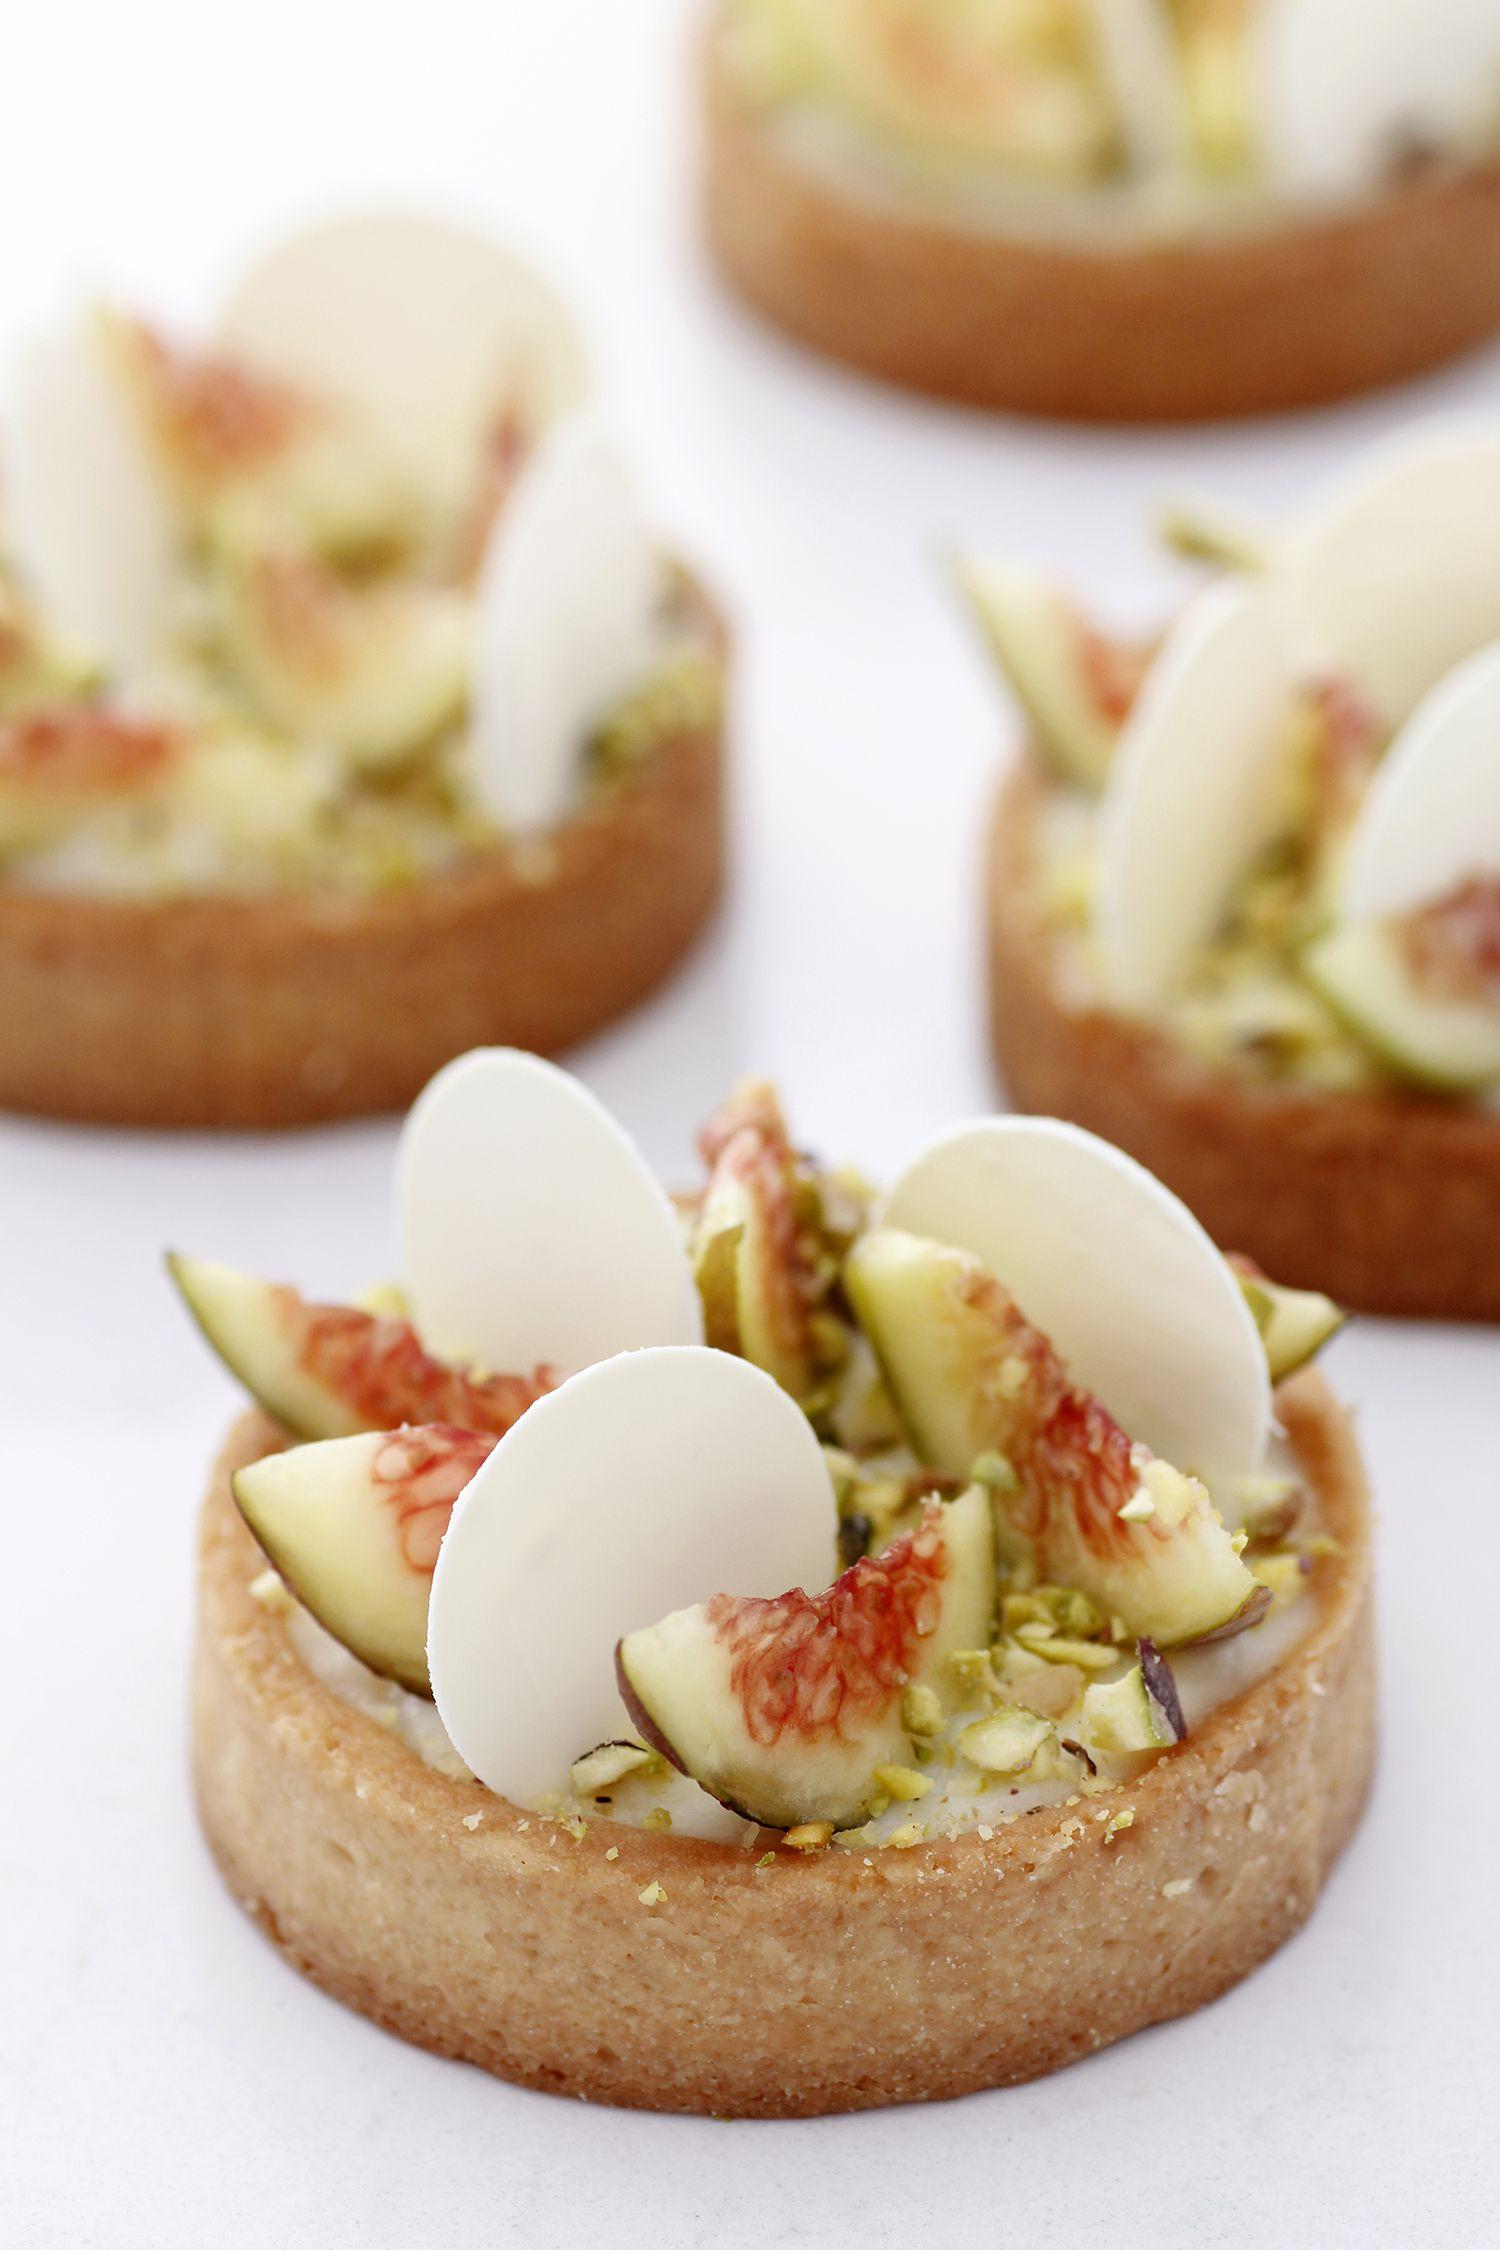 Vanilla Tart With Figs And Pistachio